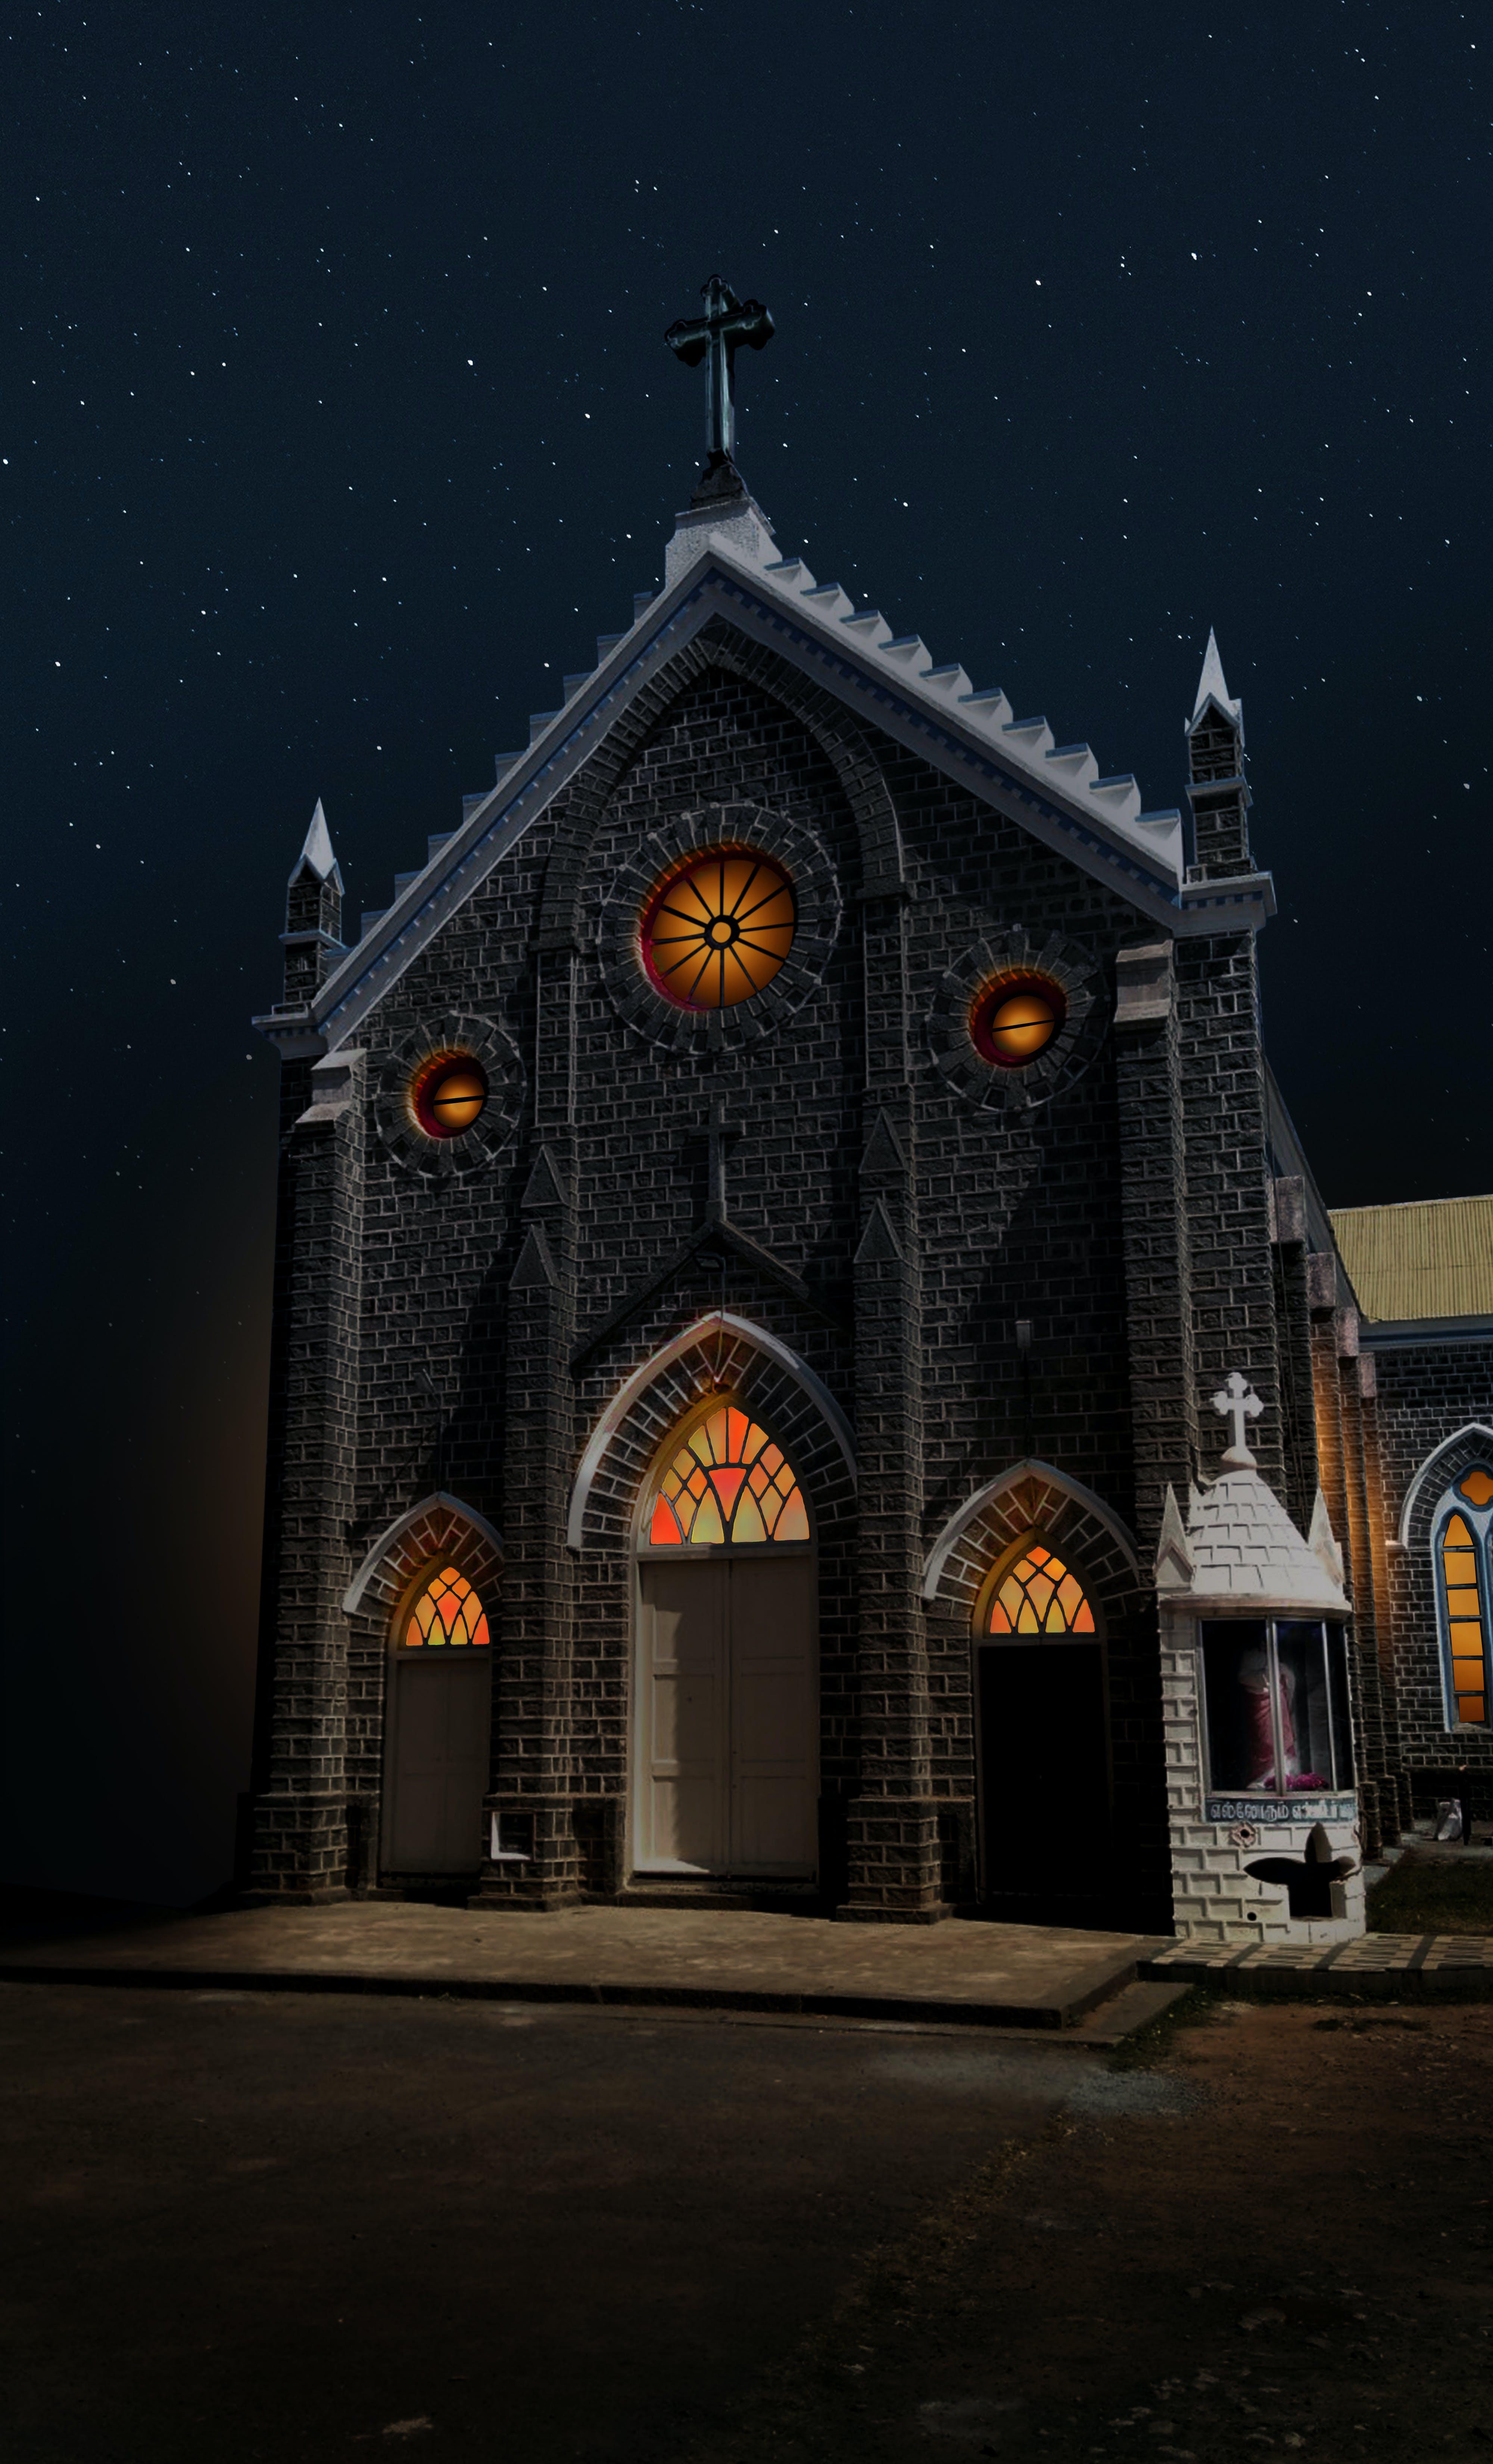 Free stock photo of church, night lights, night photography, night sky